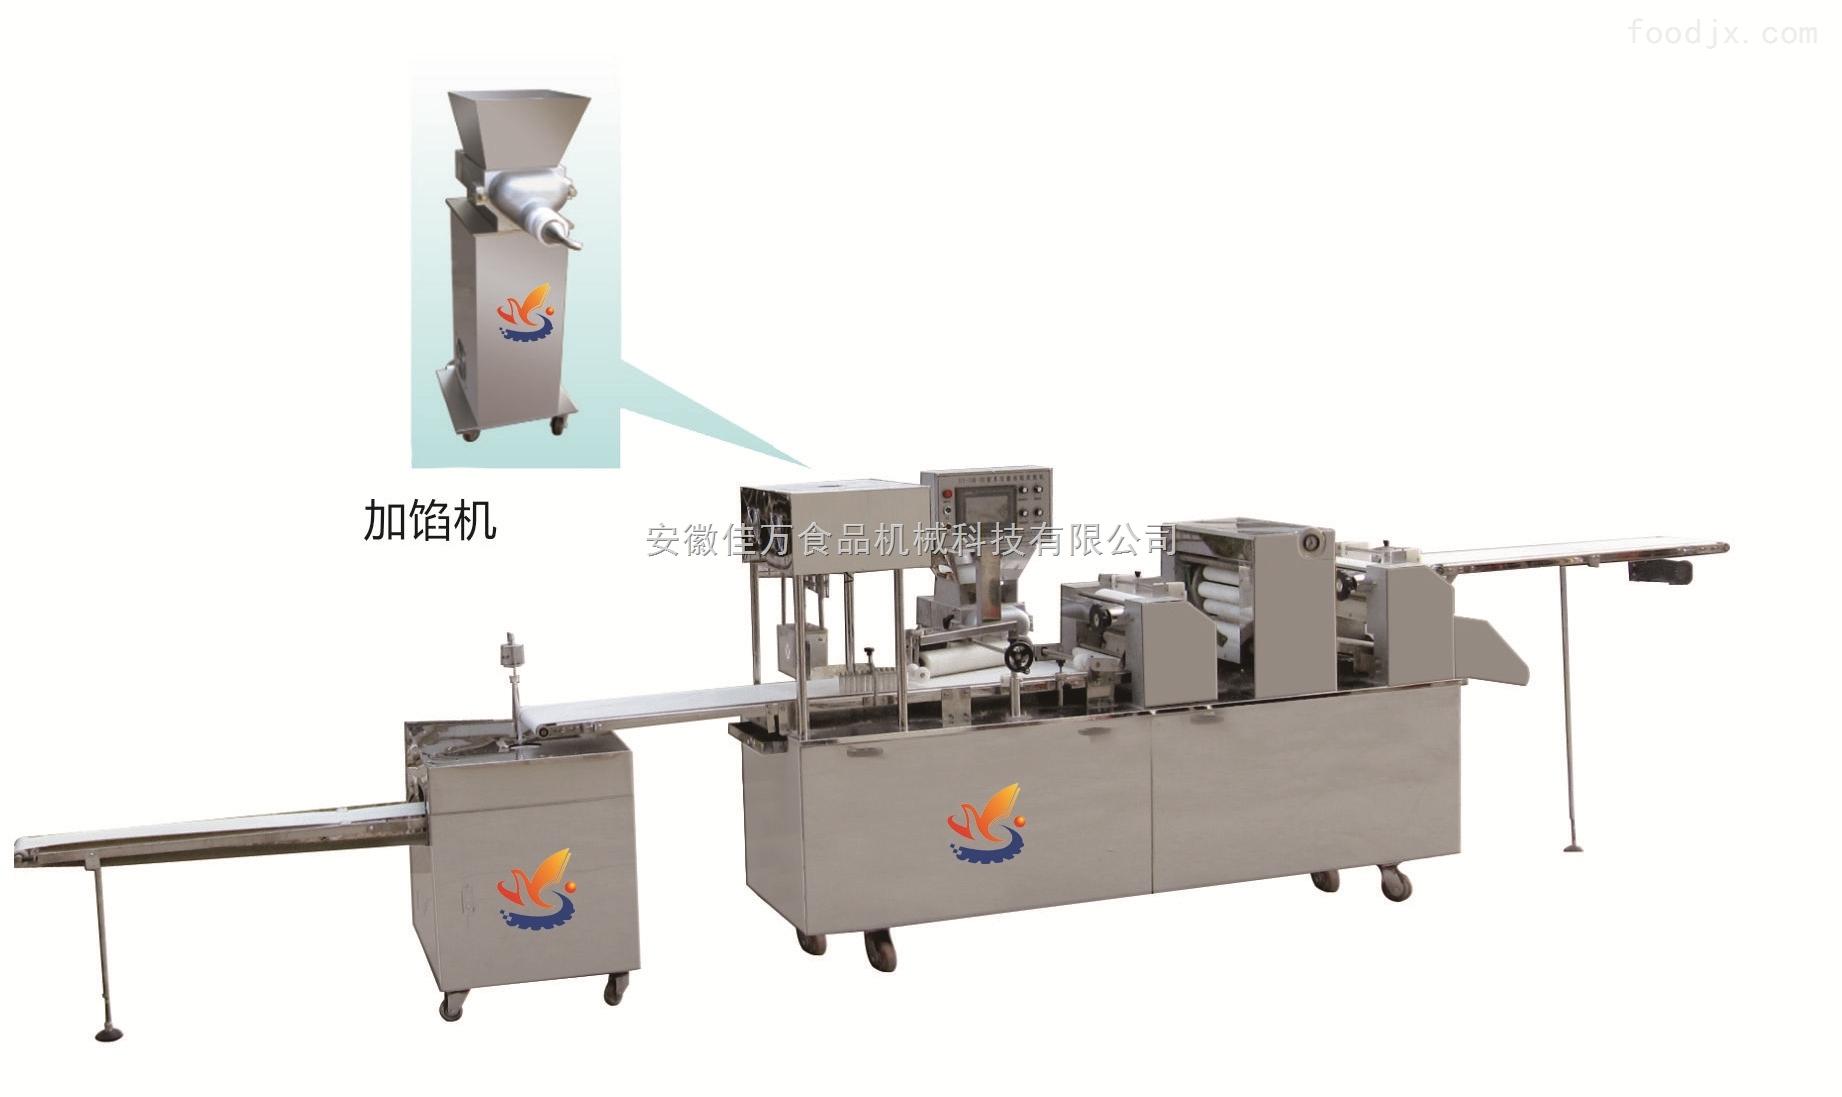 JWSM-III-酥饼生产线